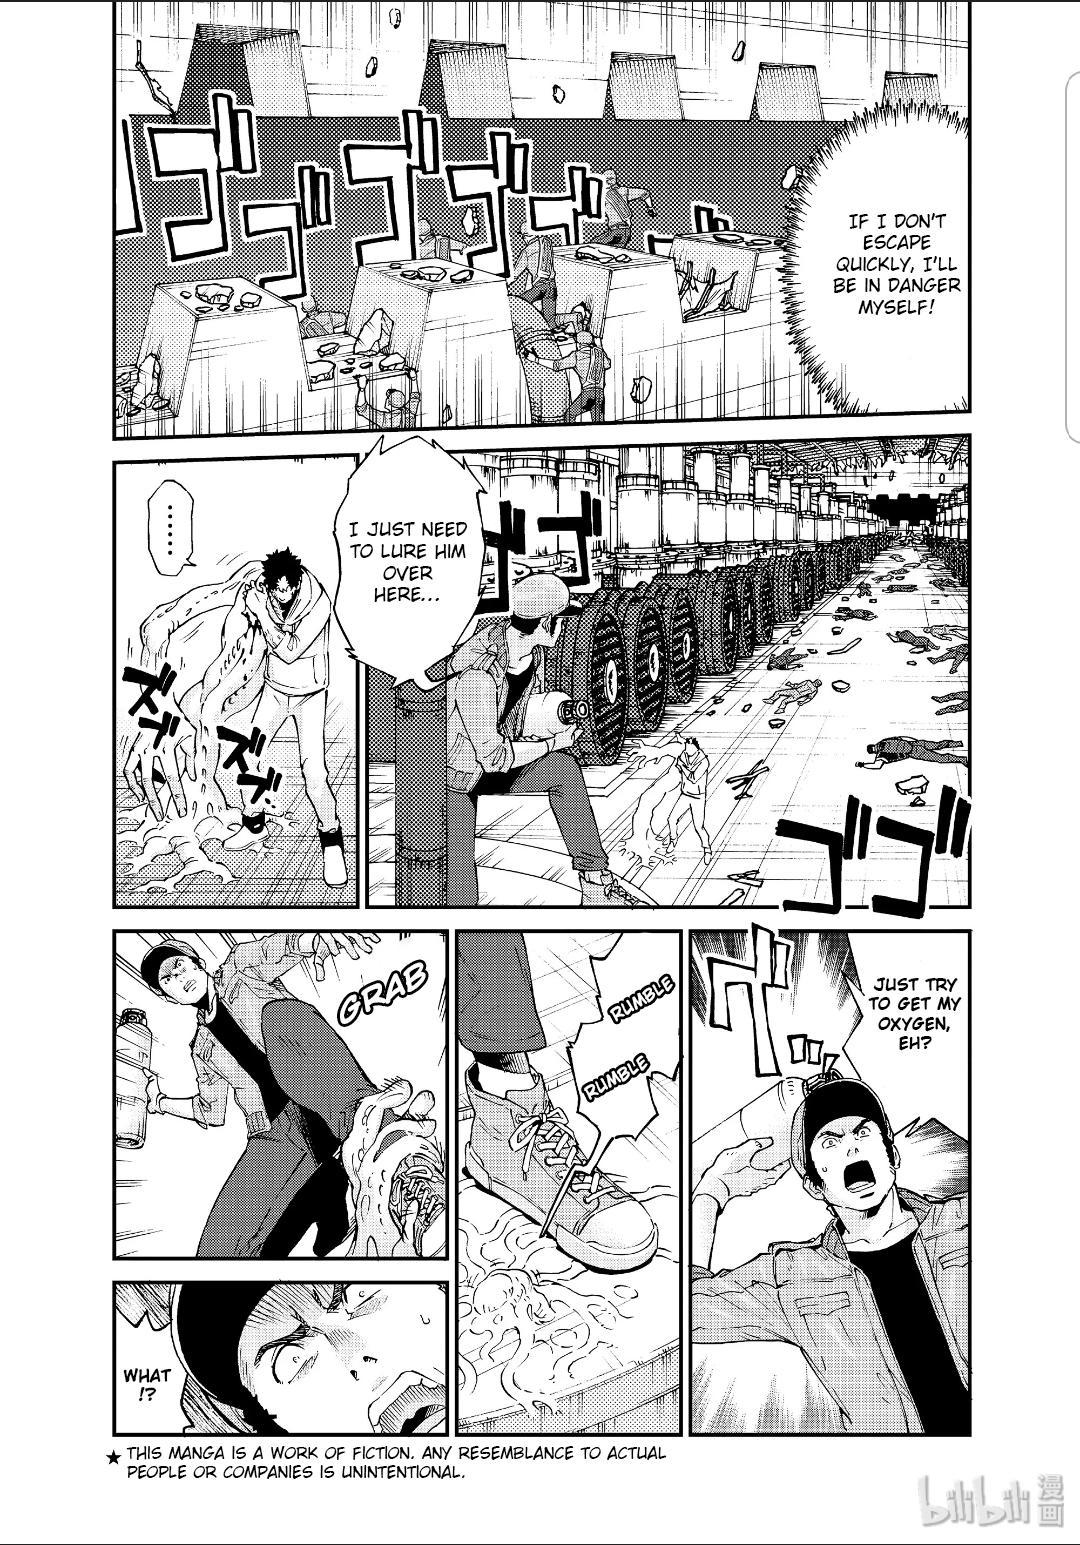 Hataraku Saibou Black Vol.7 Chapter 39 page 6 - Mangakakalots.com